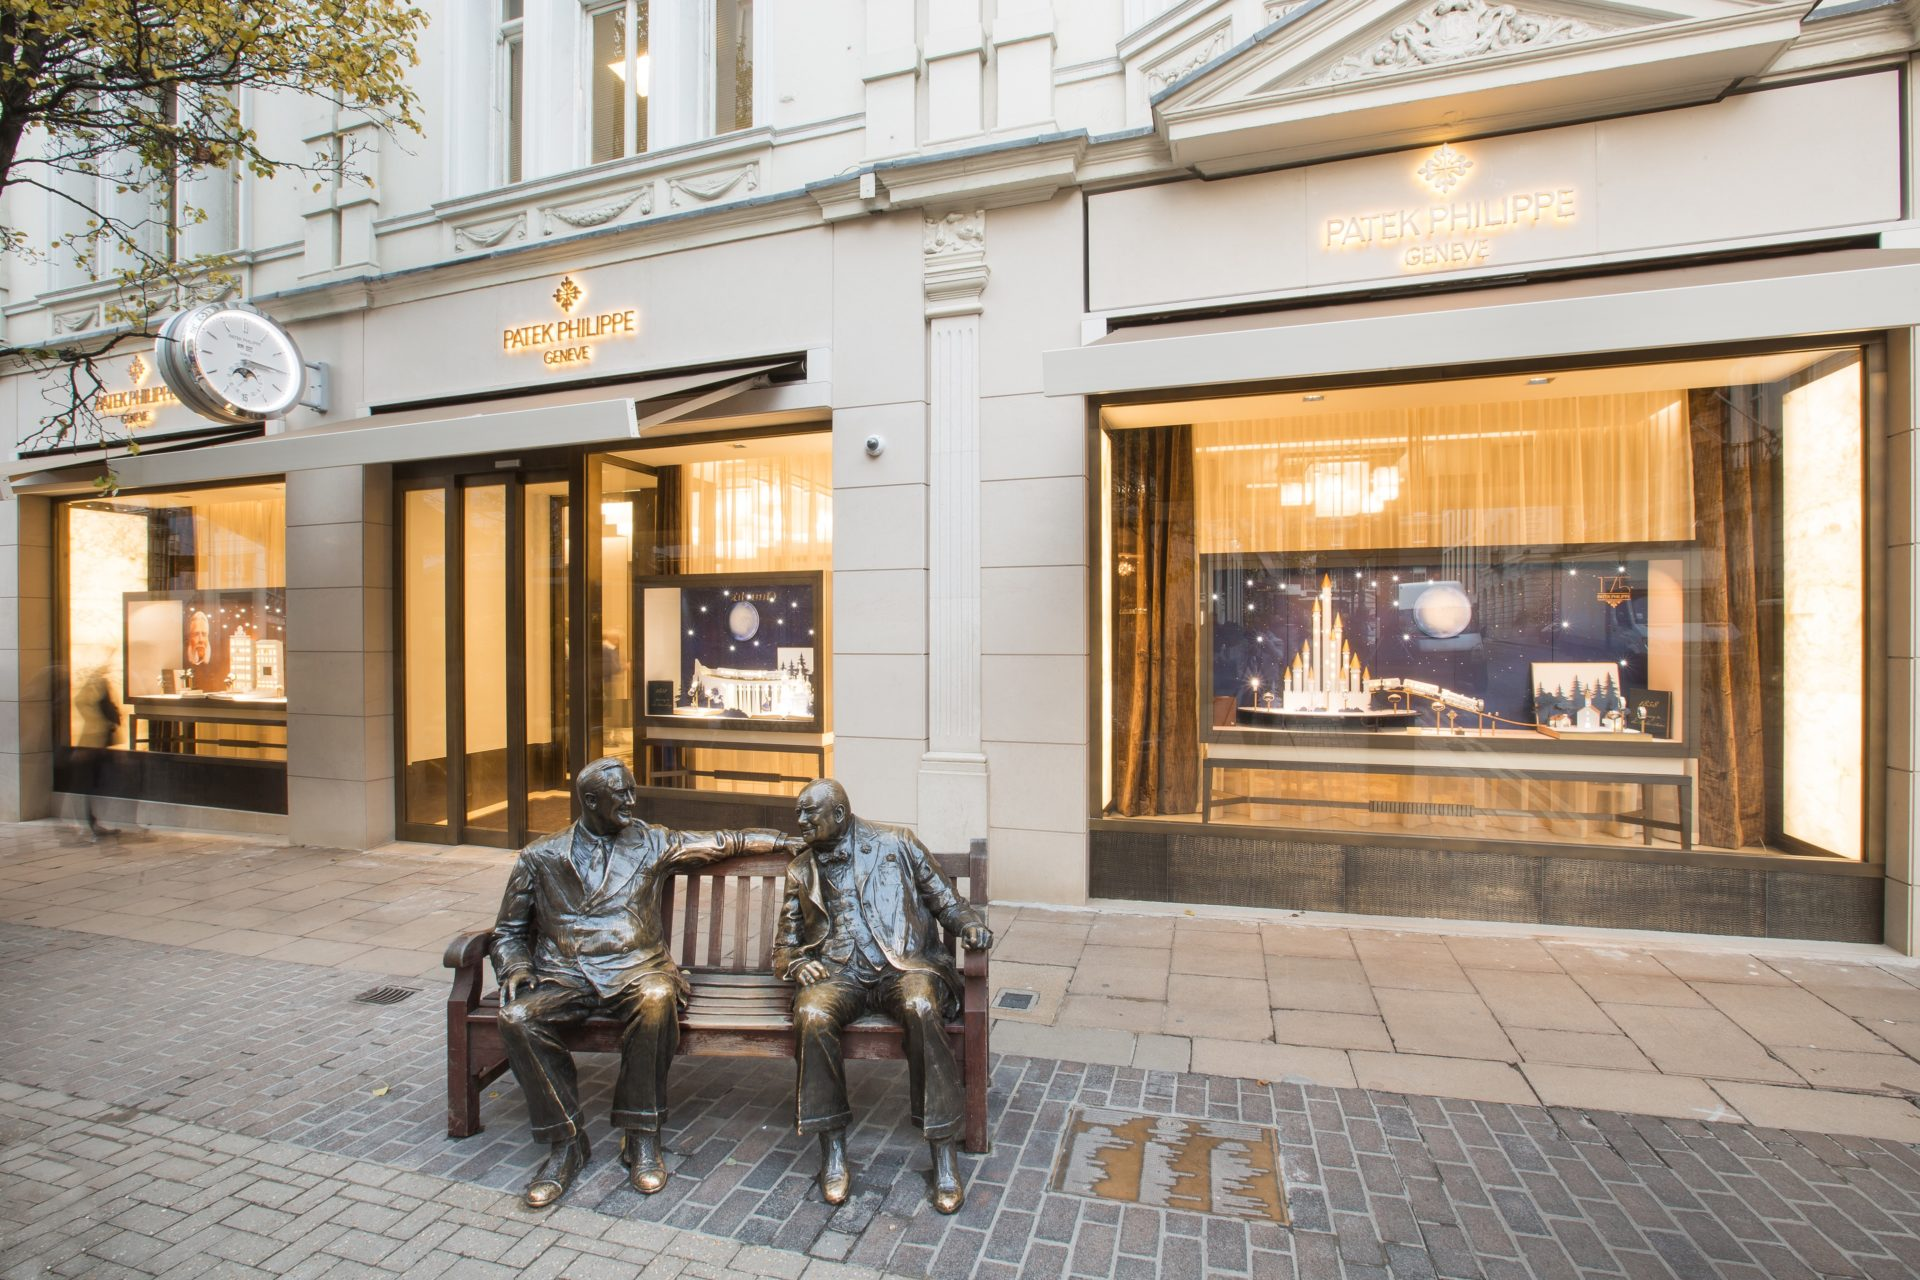 Patek Philippe London Salon – Front view lower